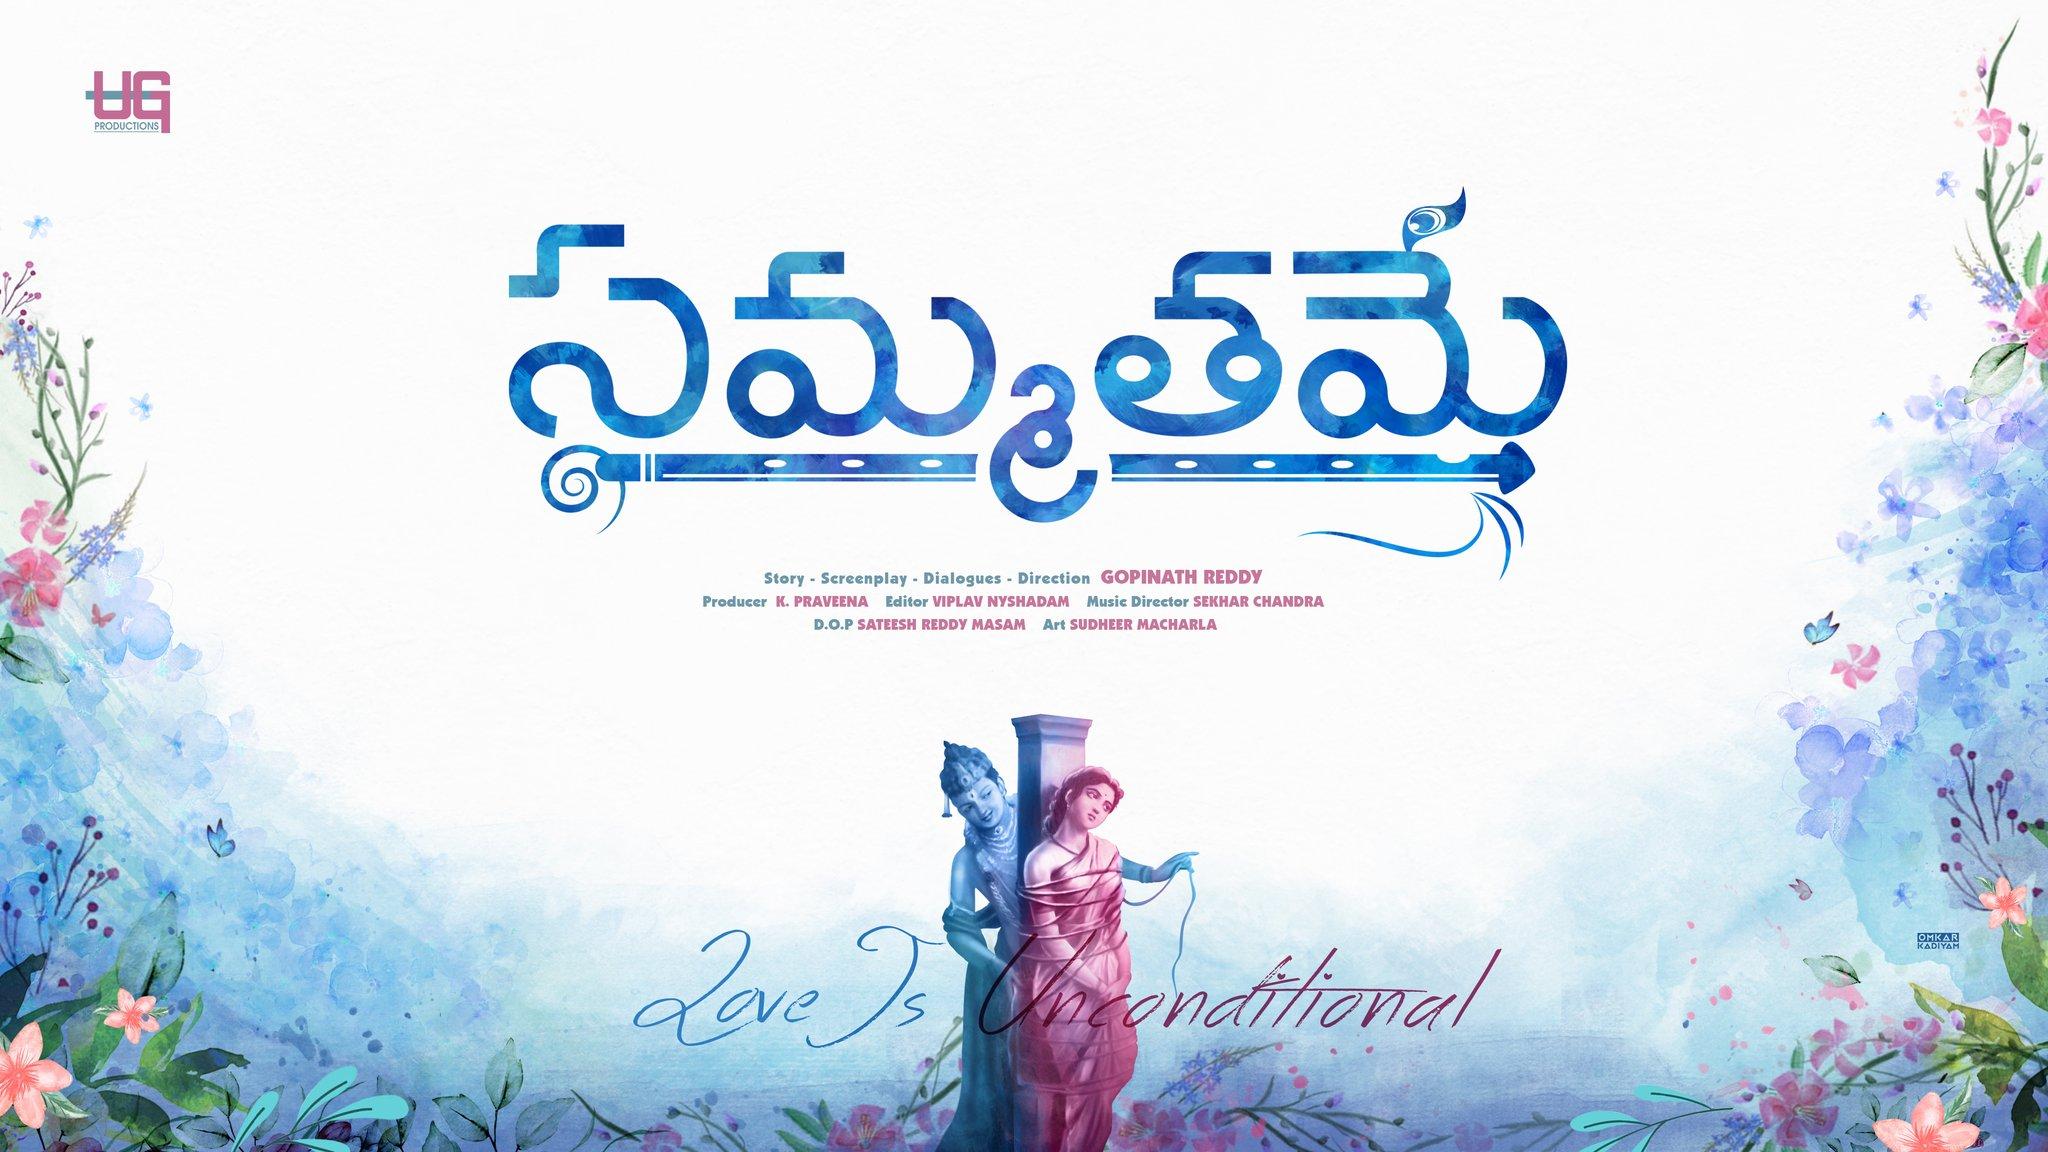 Hero Kiran Abbavaram Sammathame movie title poster unveiled